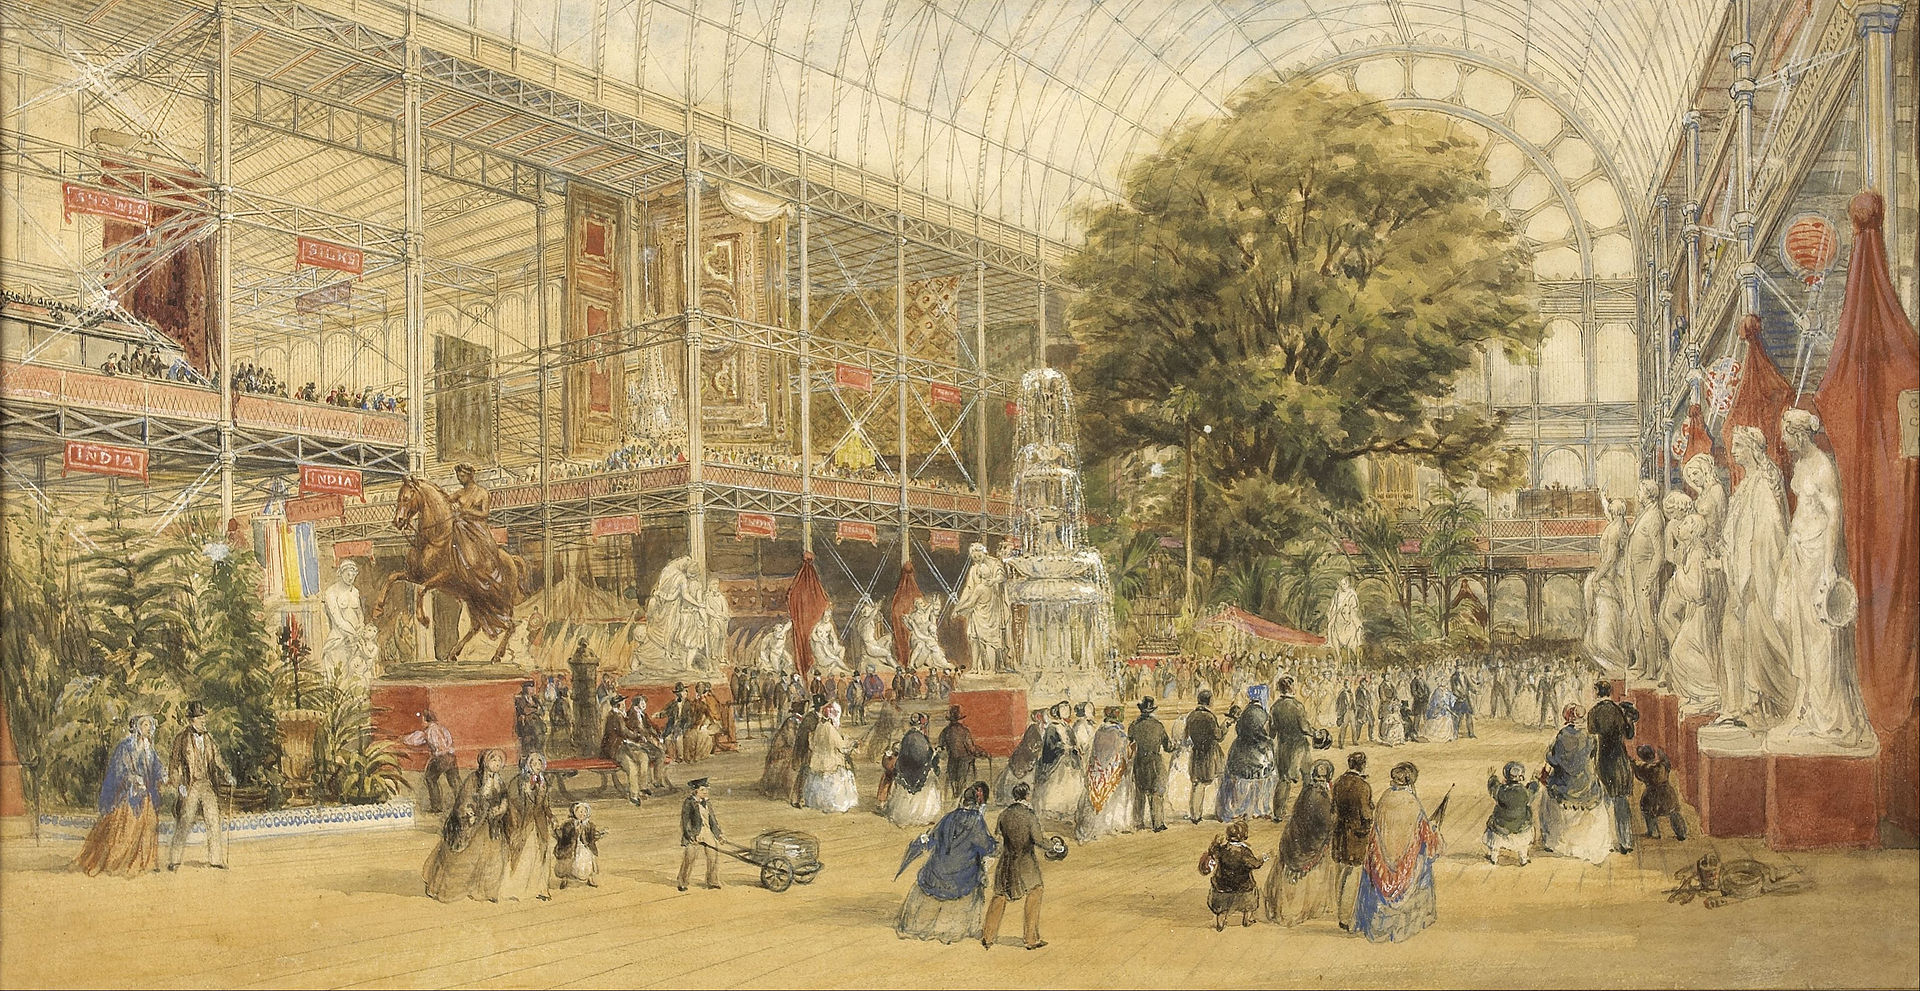 crystal palace, london